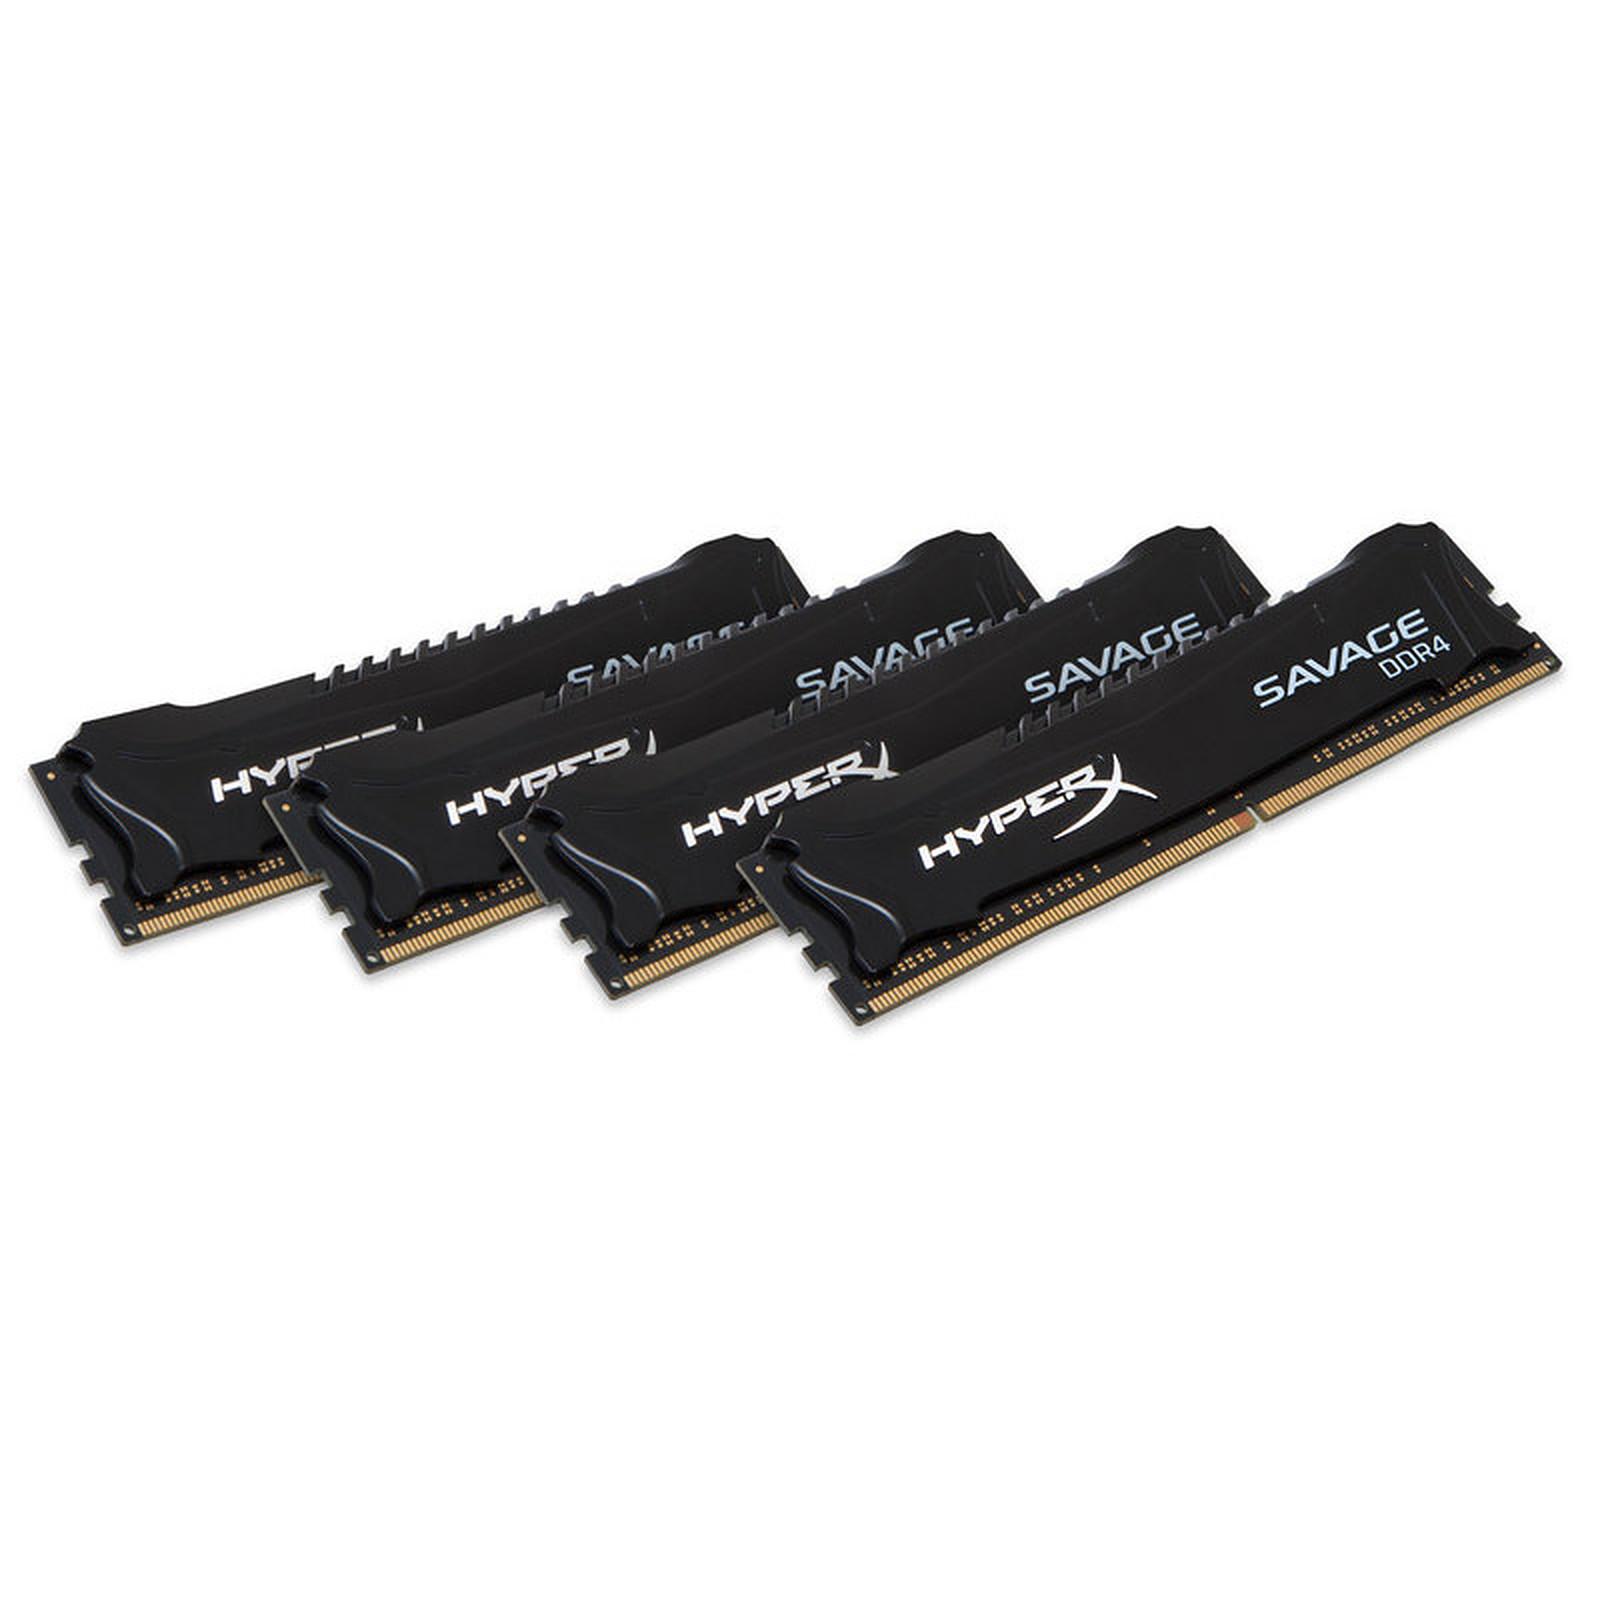 HyperX Savage Noir 16 Go (4x 4Go) DDR4 2666 MHz CL13